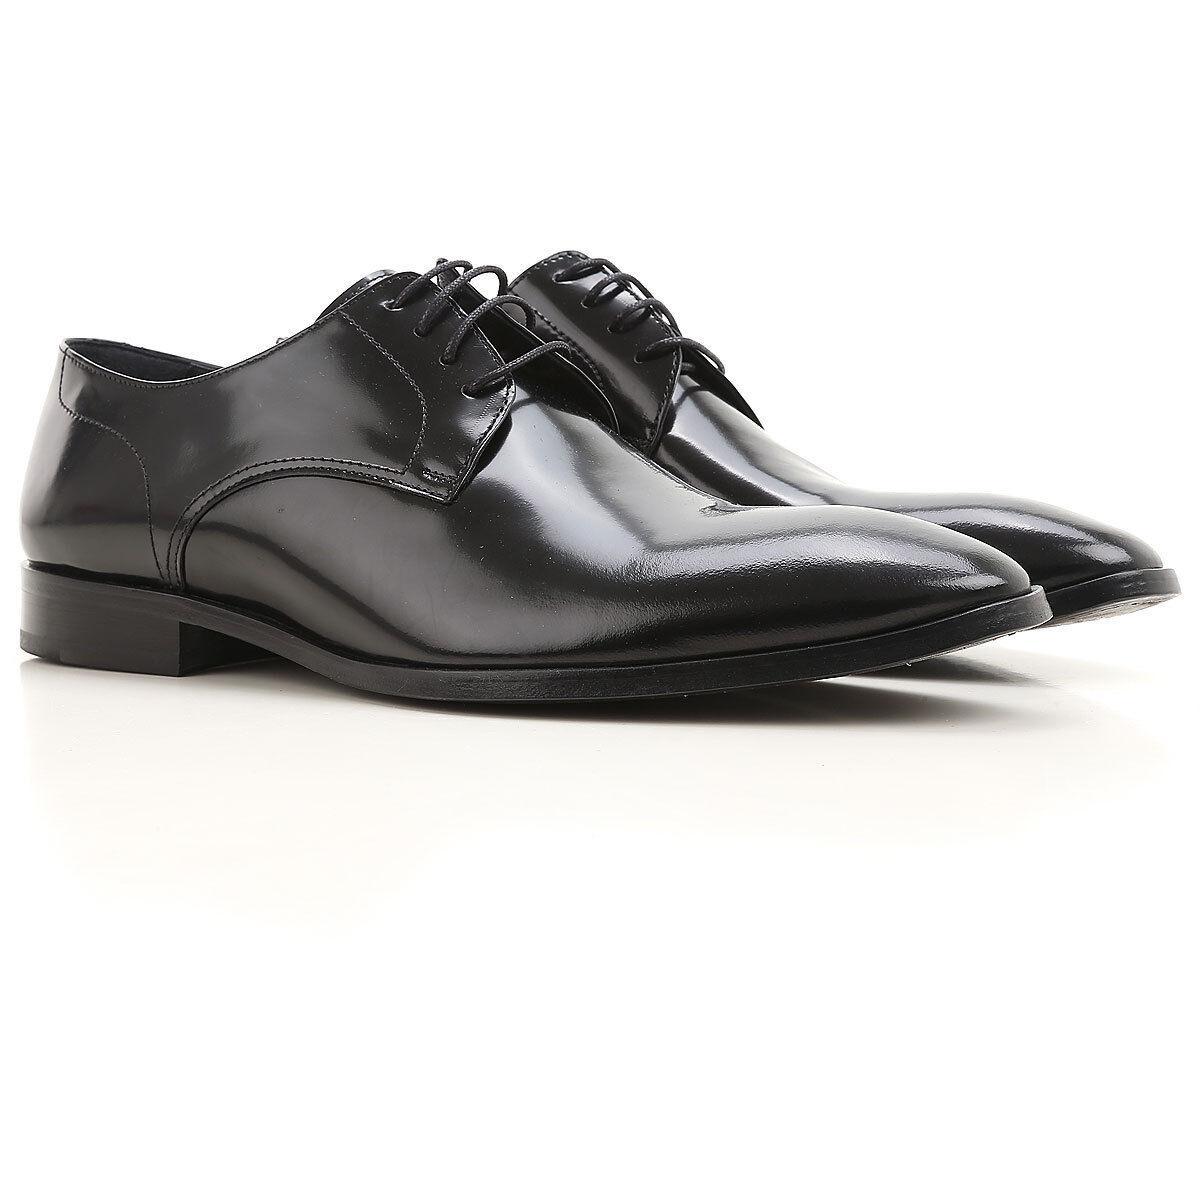 Karl Lagerfeld Allacciata Formal, Formal, Allacciata Formal shoes 175e8f